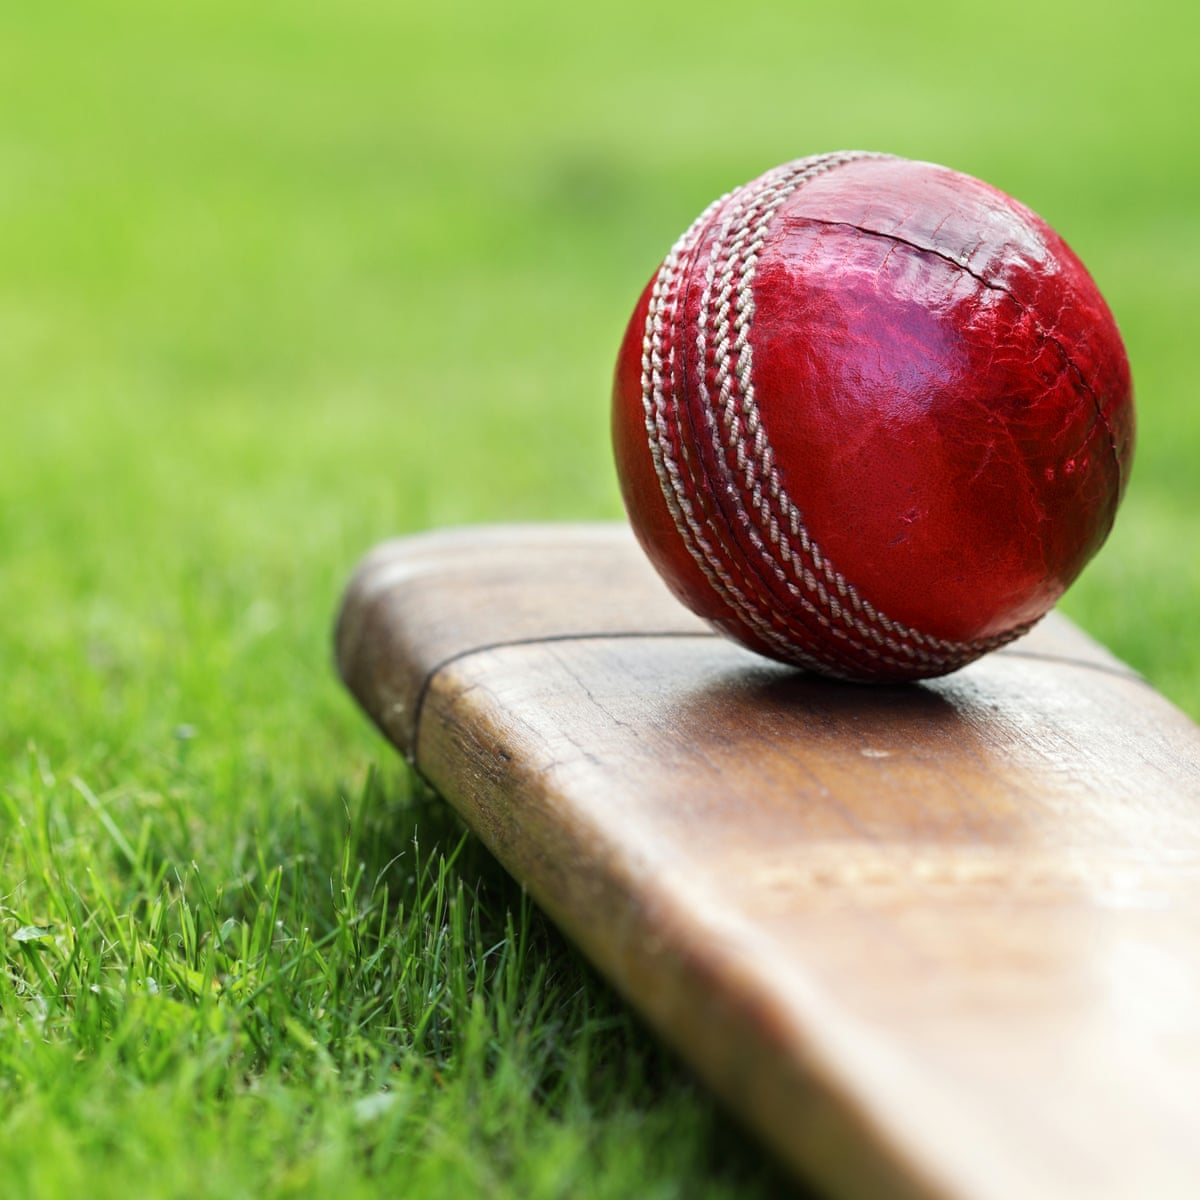 Women's Senior One Day Trophy Dream11 Prediction Fantasy Cricket Tips Dream11 Team